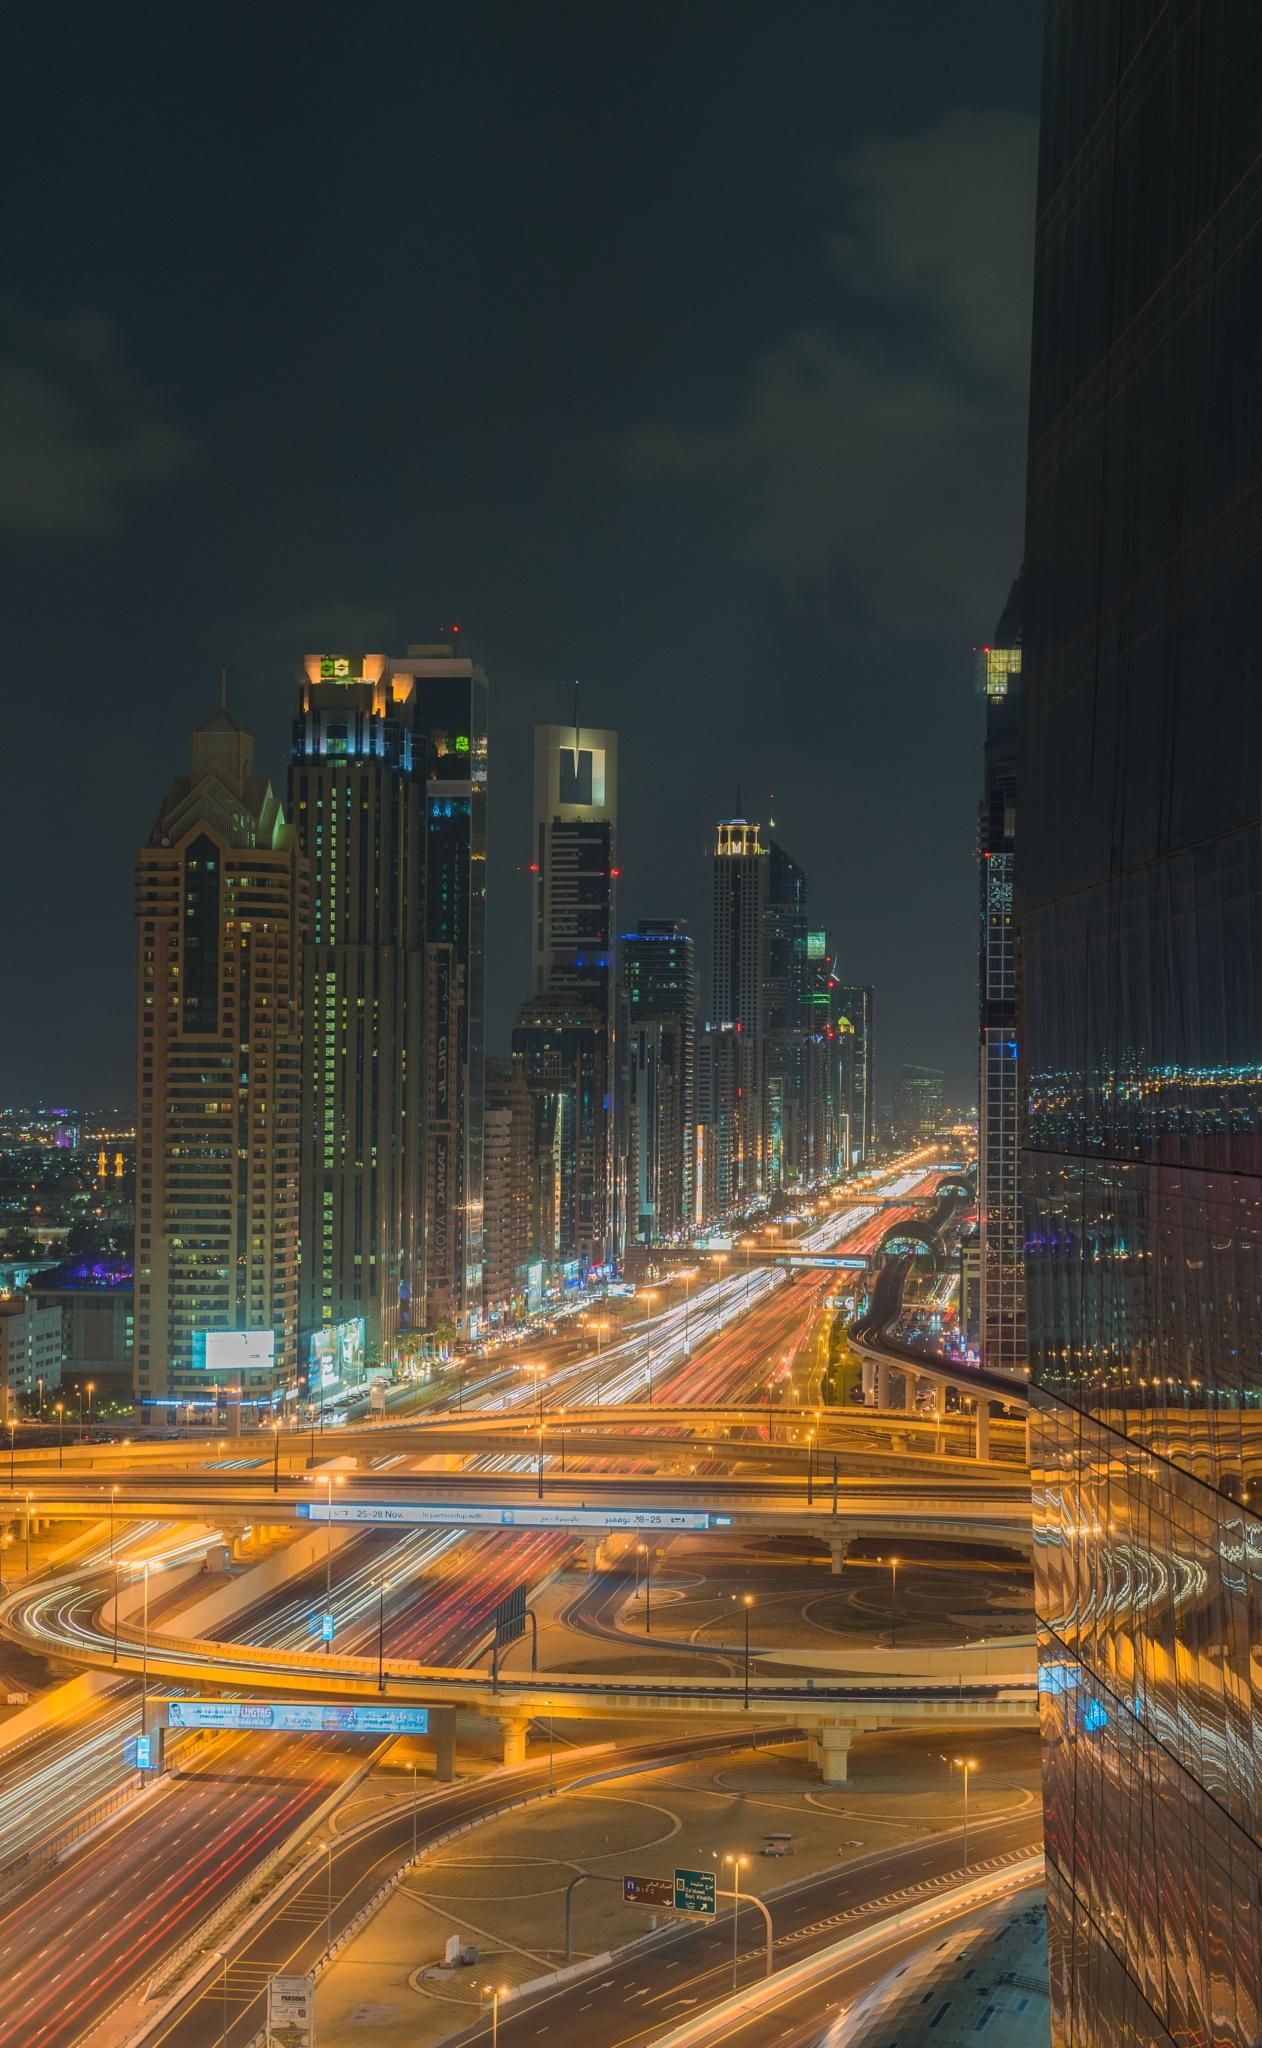 Dubai Intersection by Ashley Kydd